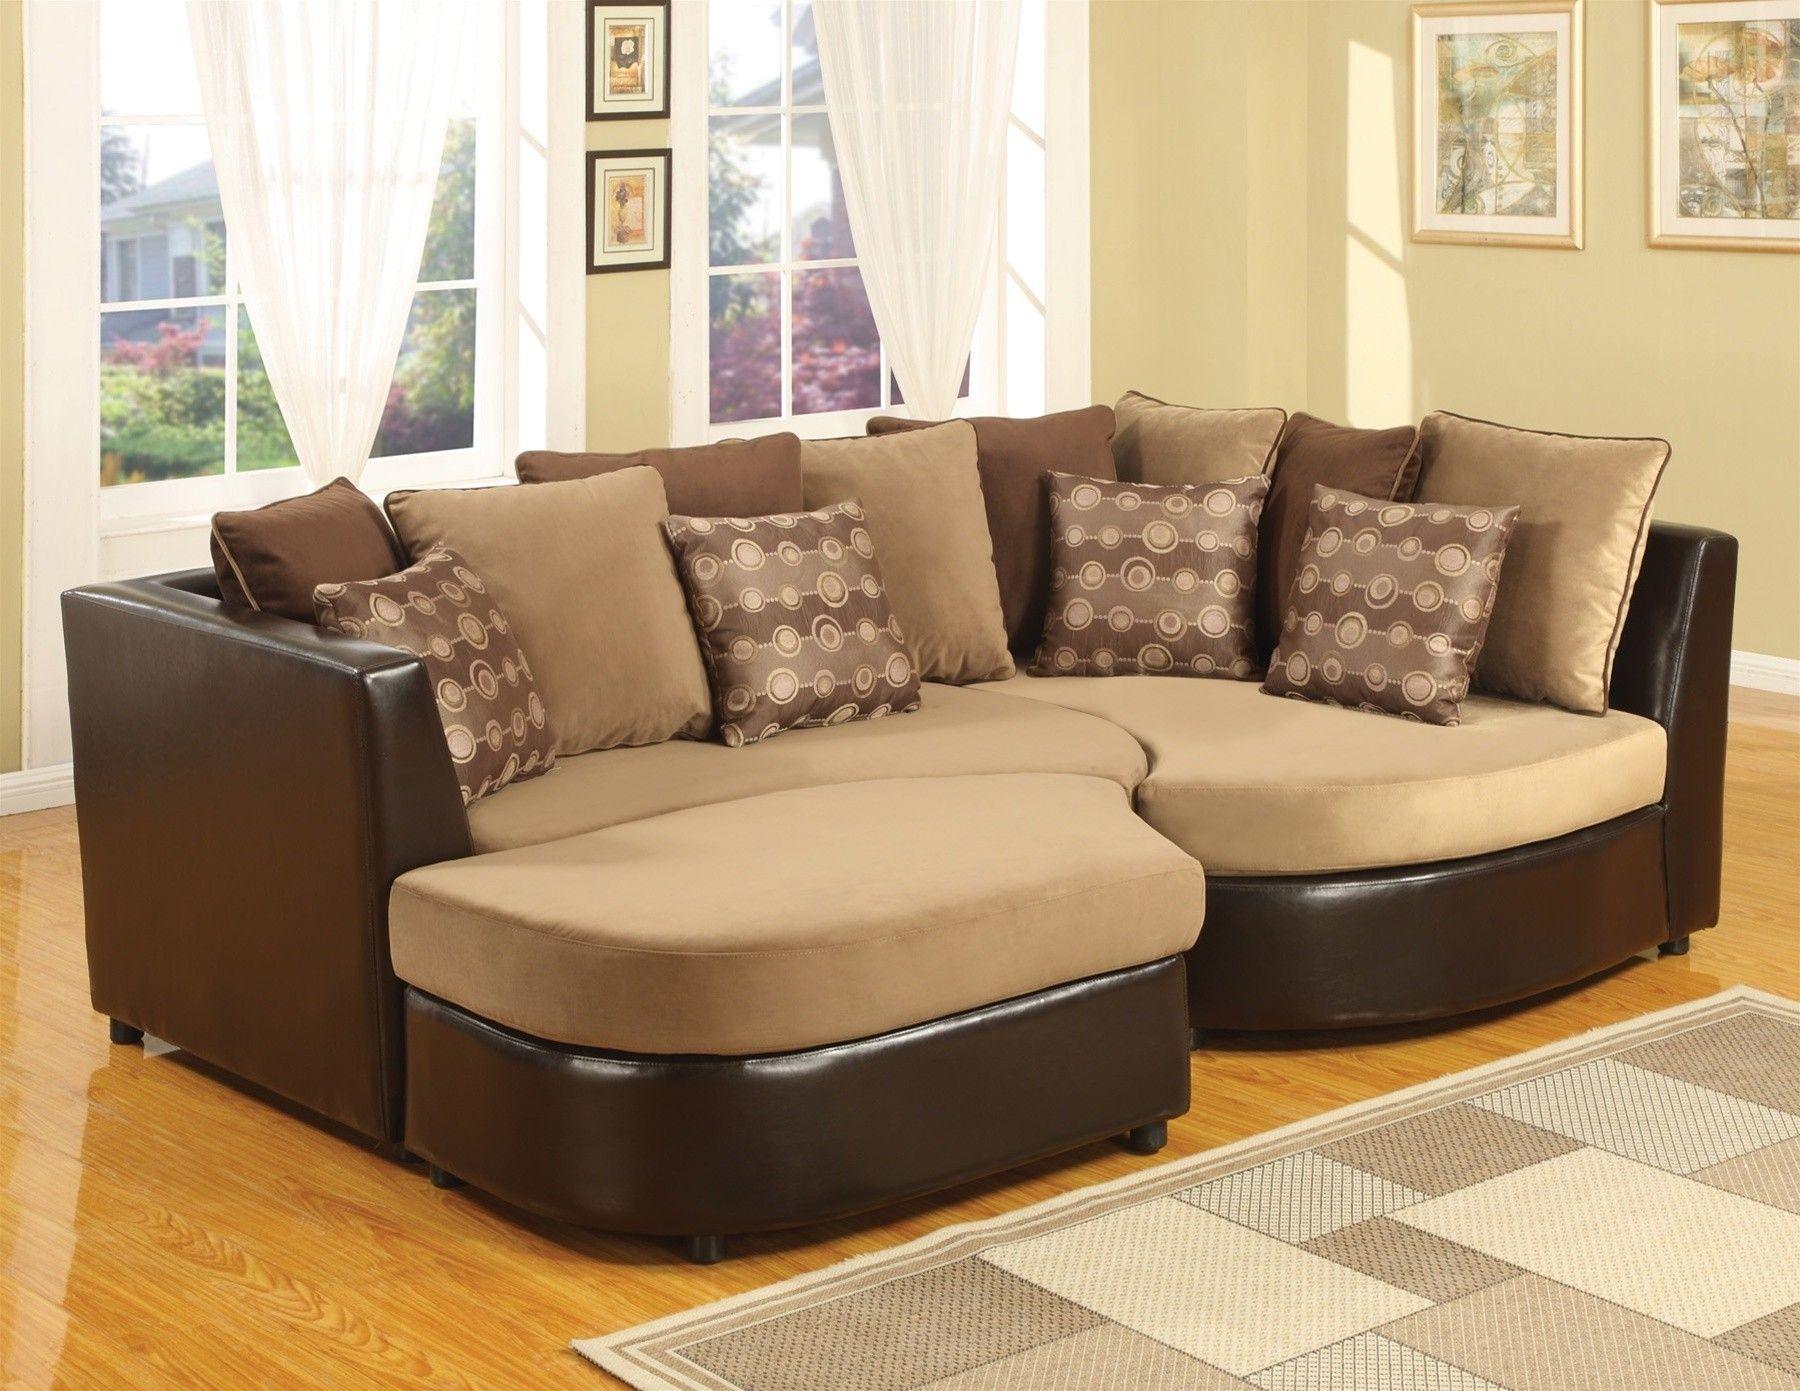 4 piece sectional puzzle sofa sofas oversized sectional sofa rh pinterest com